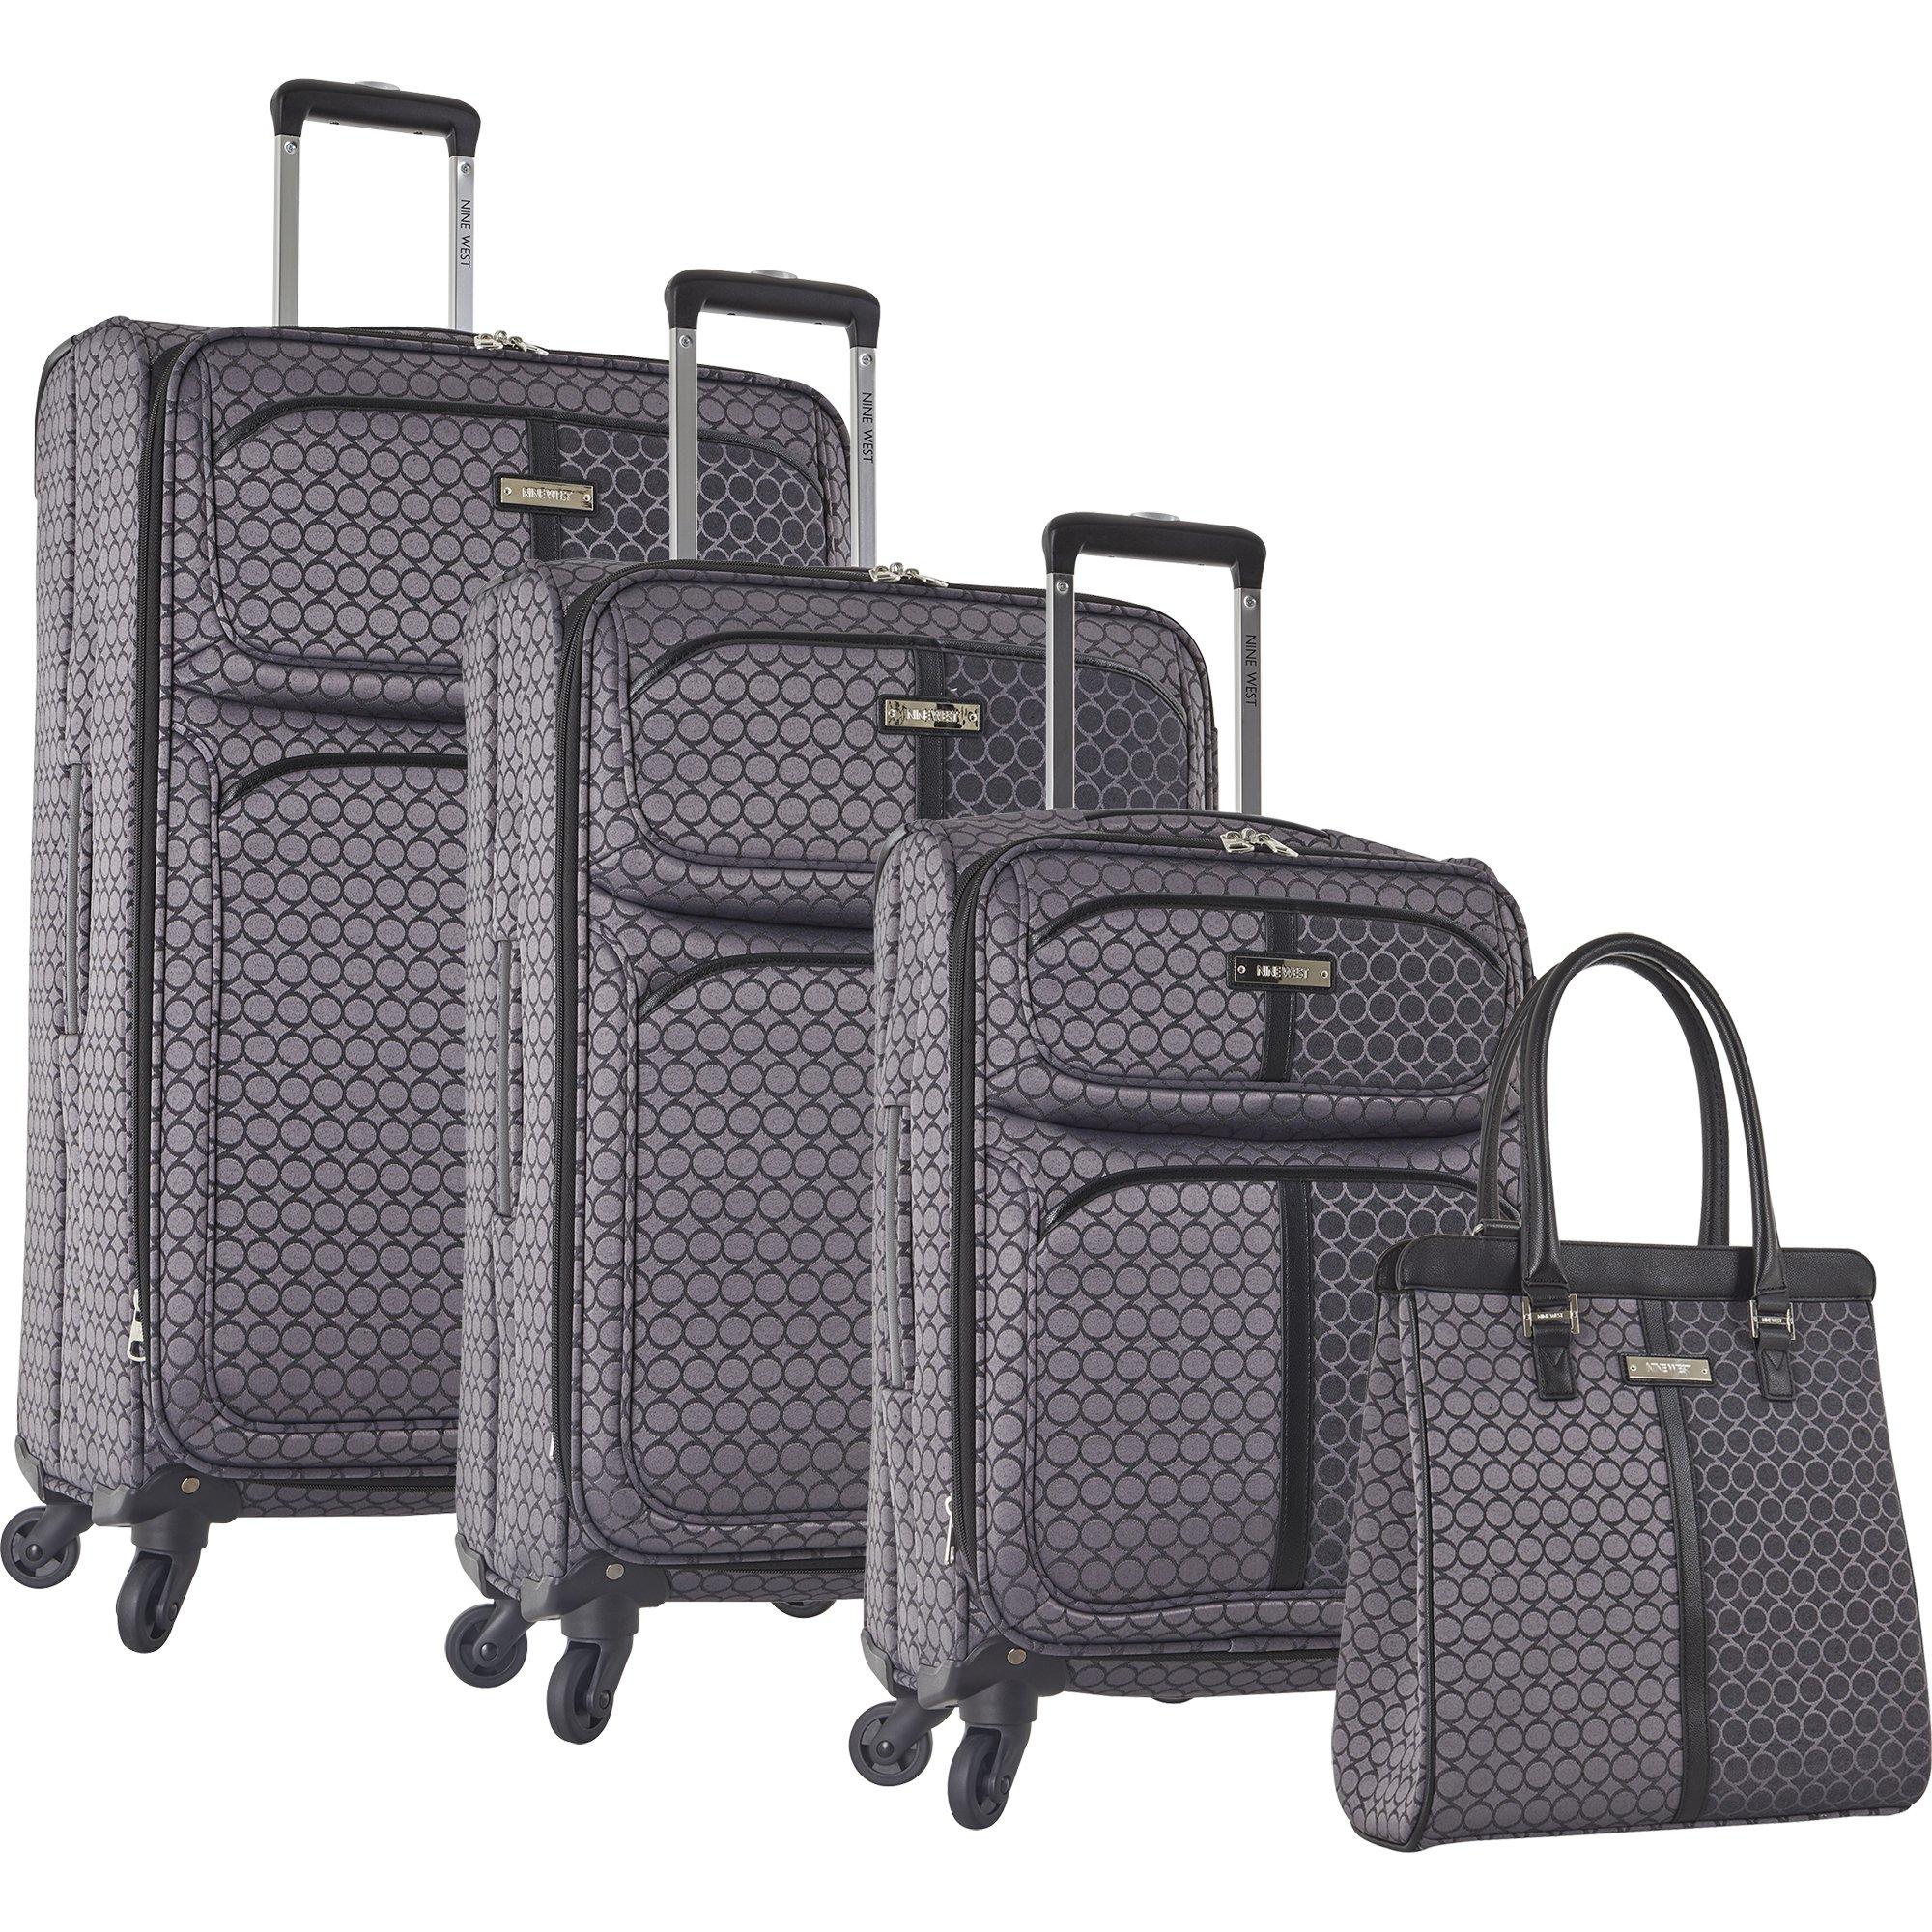 Ninewest an Adventure 4 Piece Luggage Set, Grey/Black